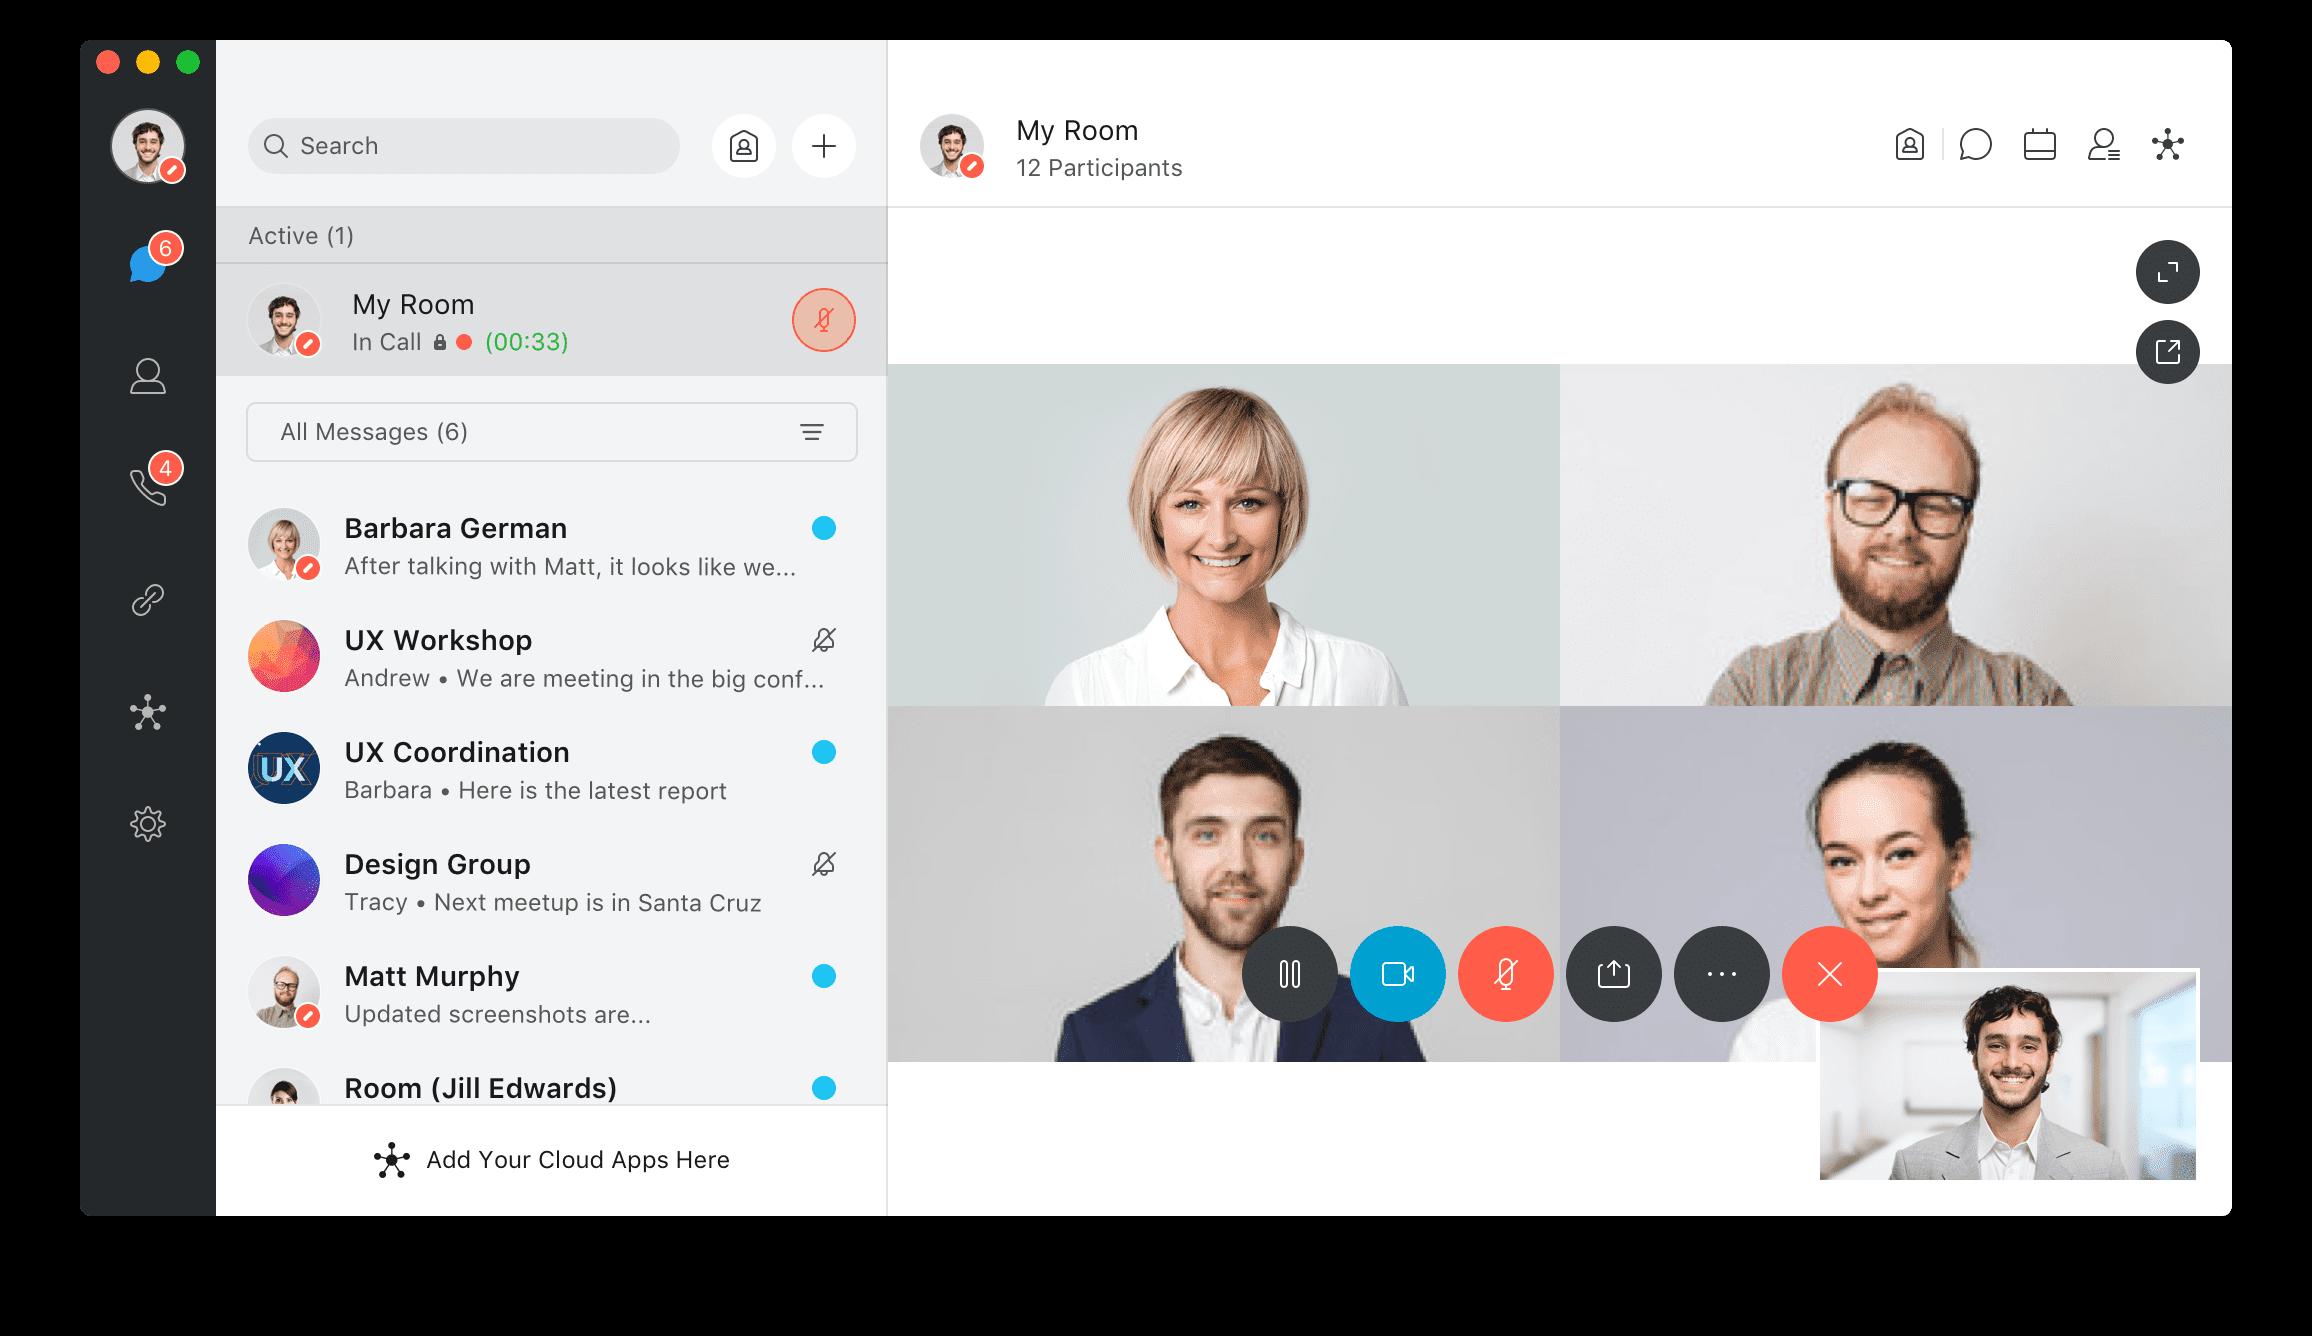 webex-user-experience